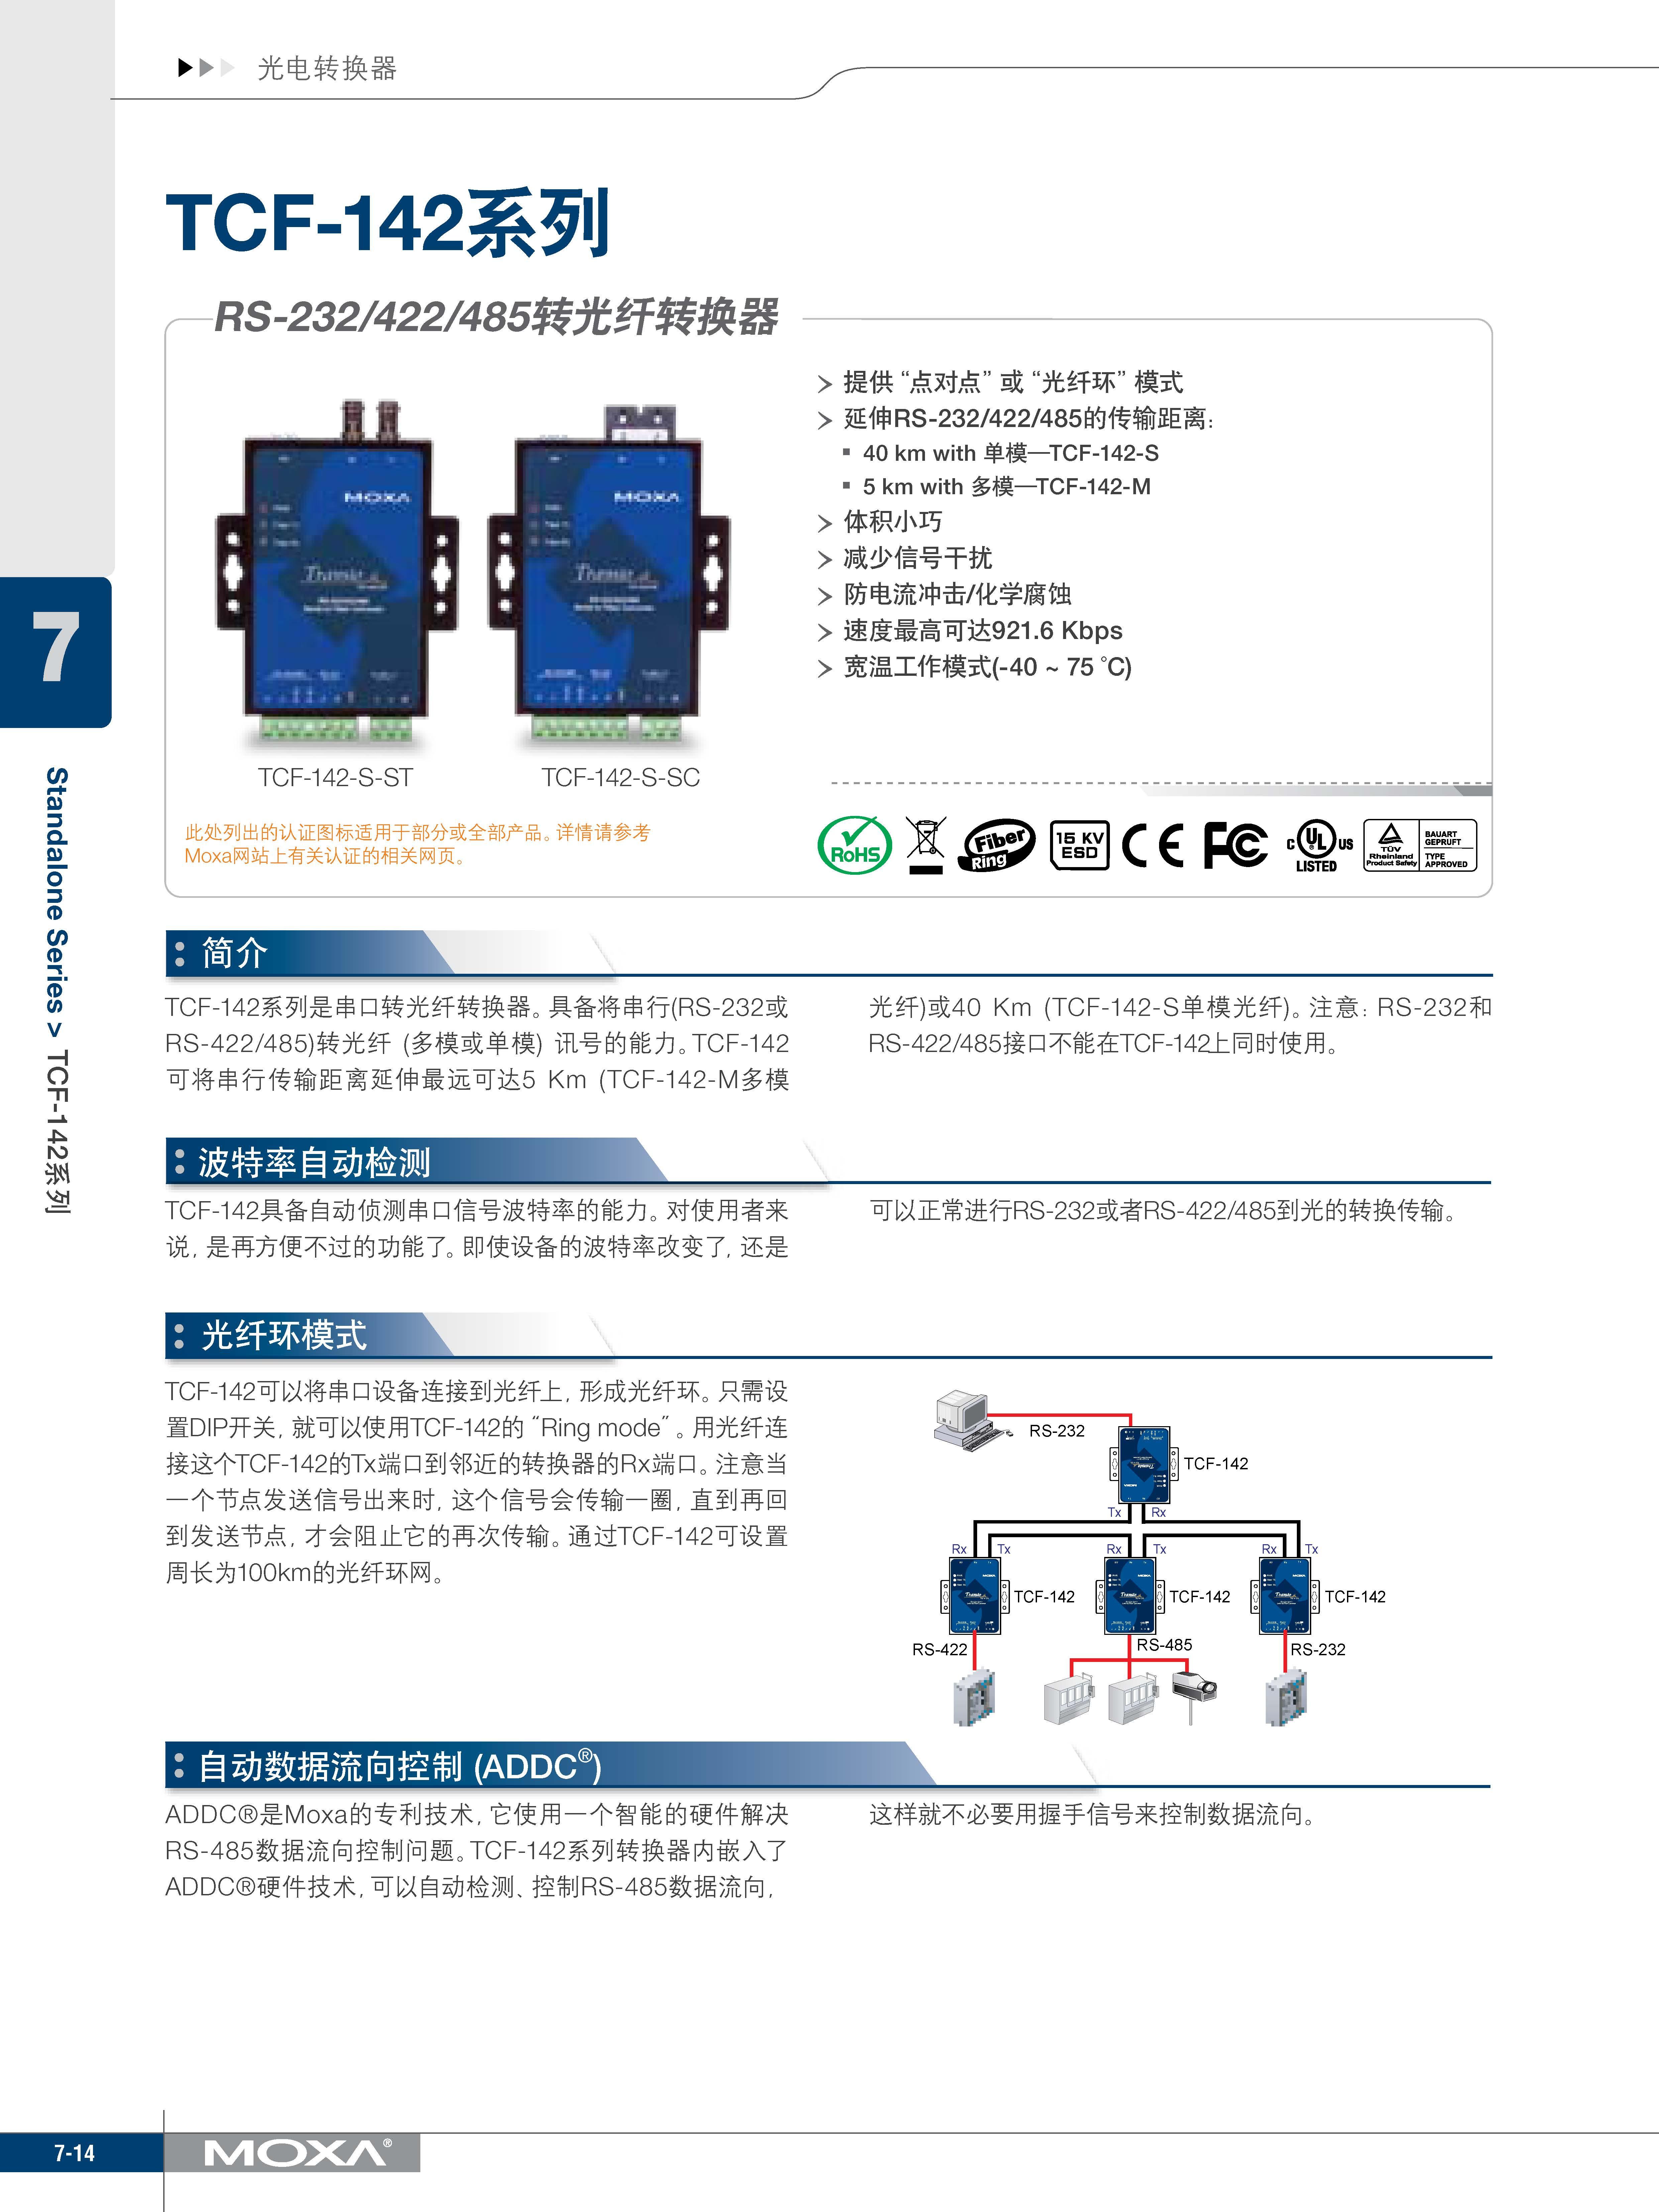 TCF-142_页面_1.jpg